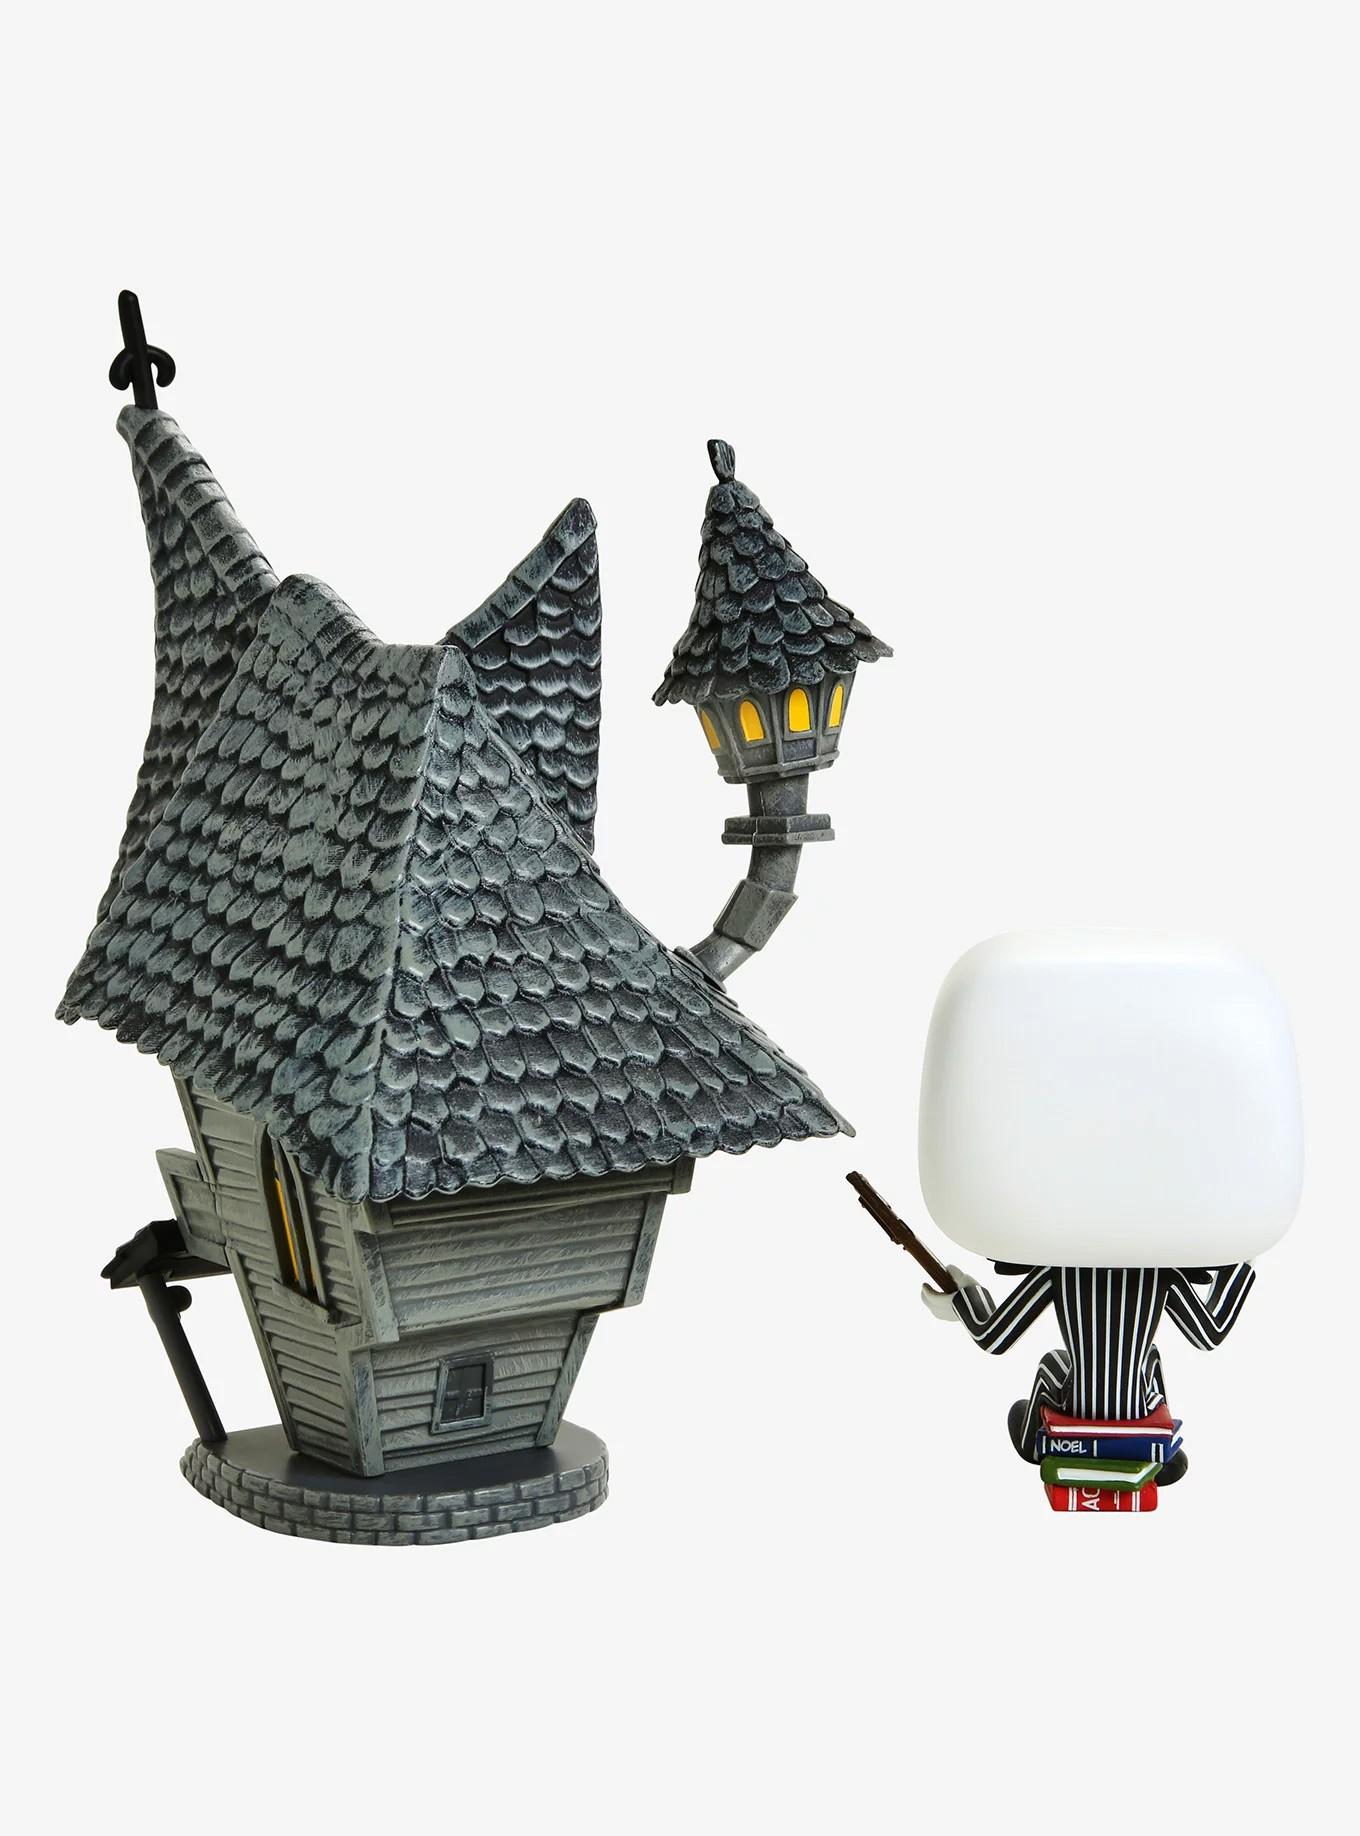 Jack Skellington & Jack's House #07 - The Nightmare Before Christmas - Funko Pop! Town